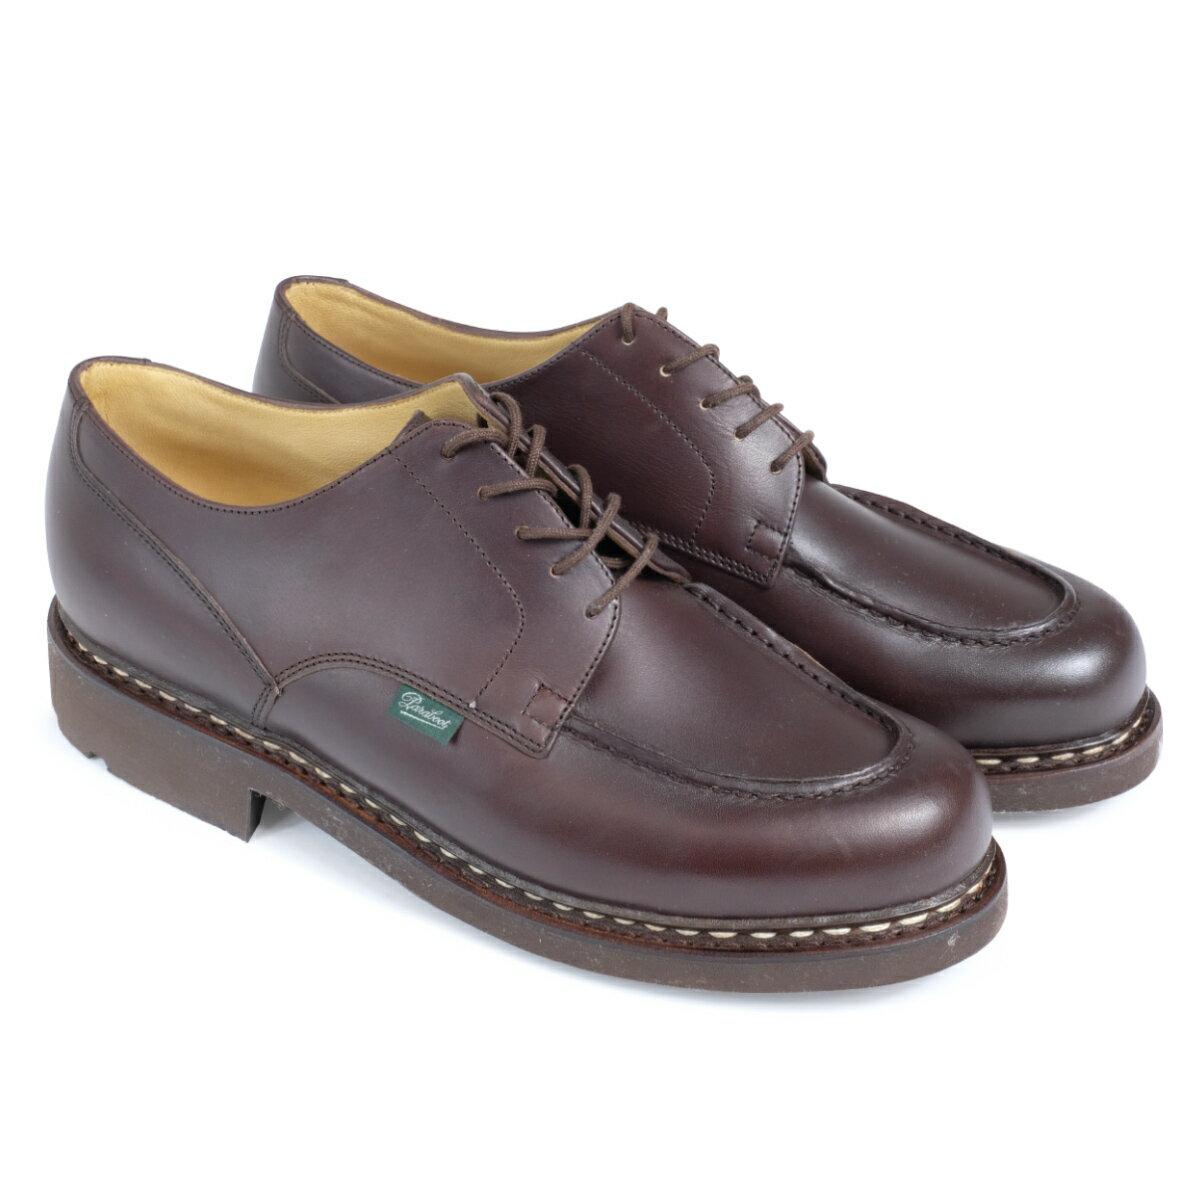 PARABOOT CHAMBORD パラブーツ シャンボード シューズ チロリアンシューズ 710707 メンズ 靴 ブラウン